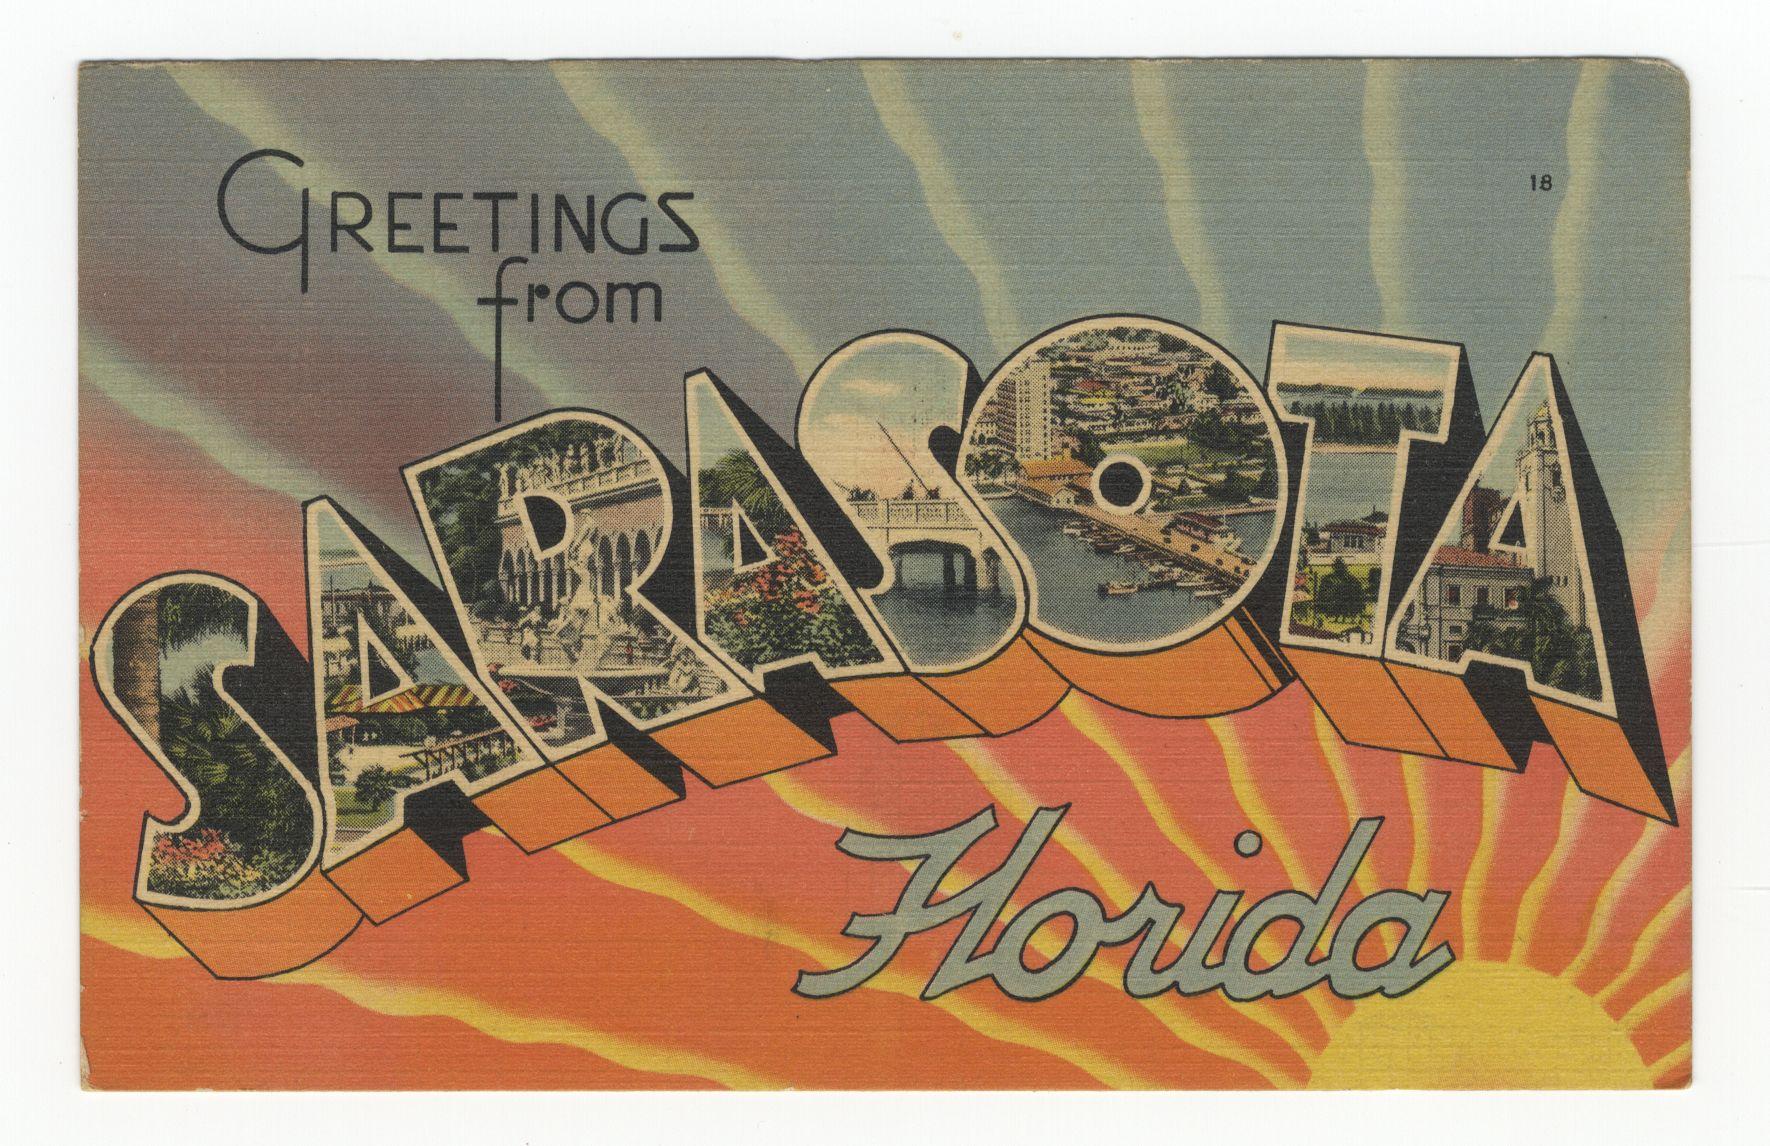 Greetings from #Sarasota #Florida - vintage postcard | Vintage ...